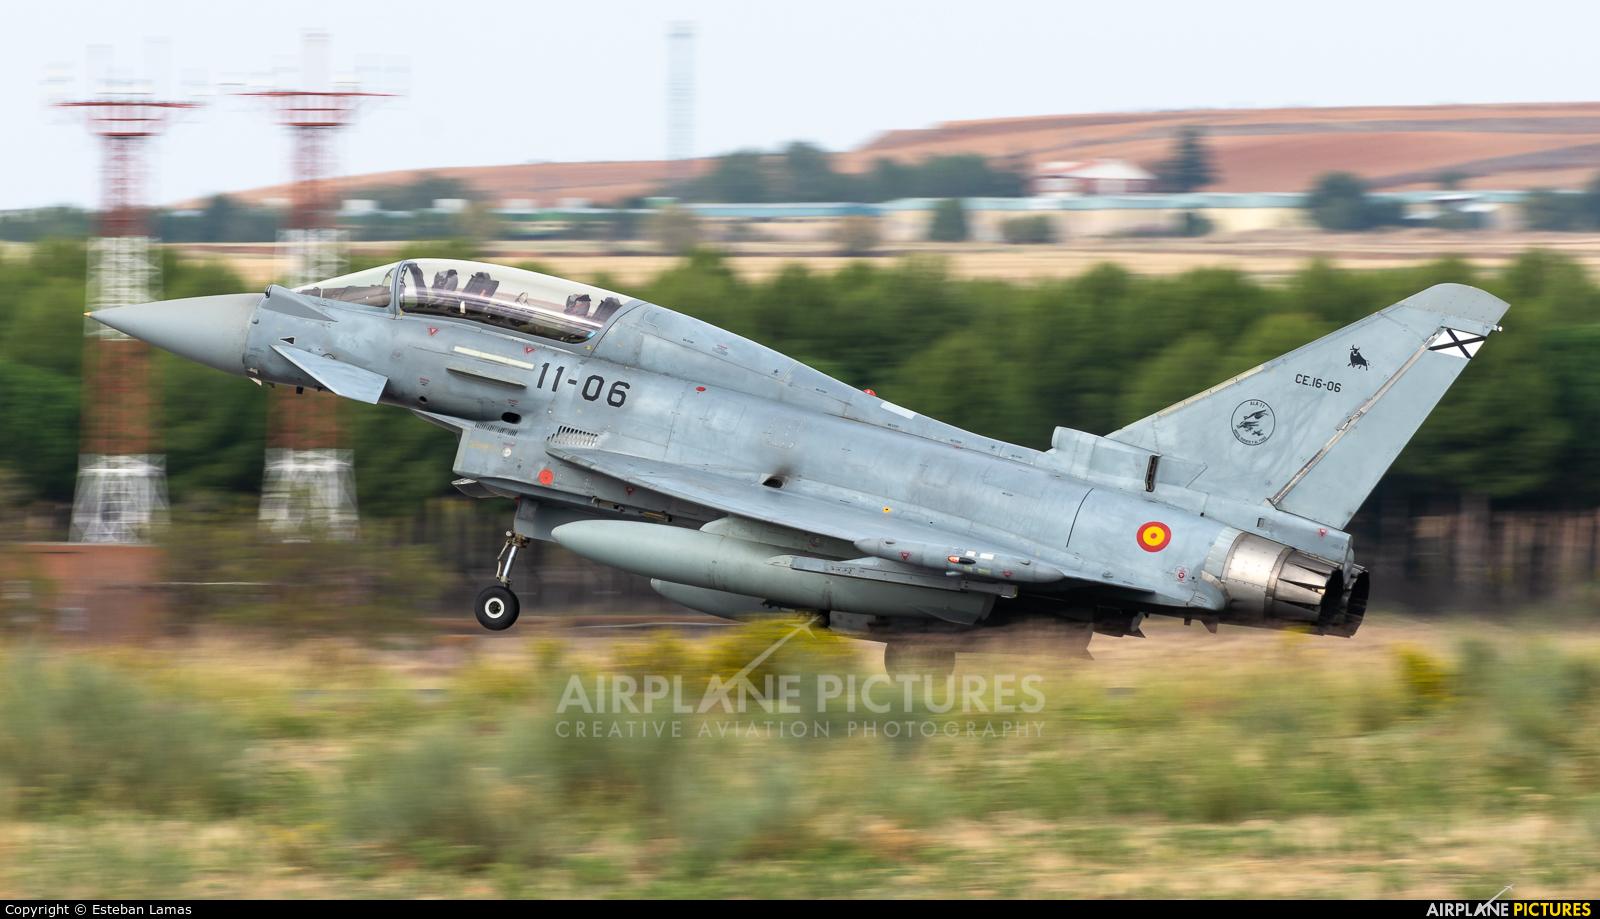 Spain - Air Force CE.16-06 aircraft at Madrid - Torrejon